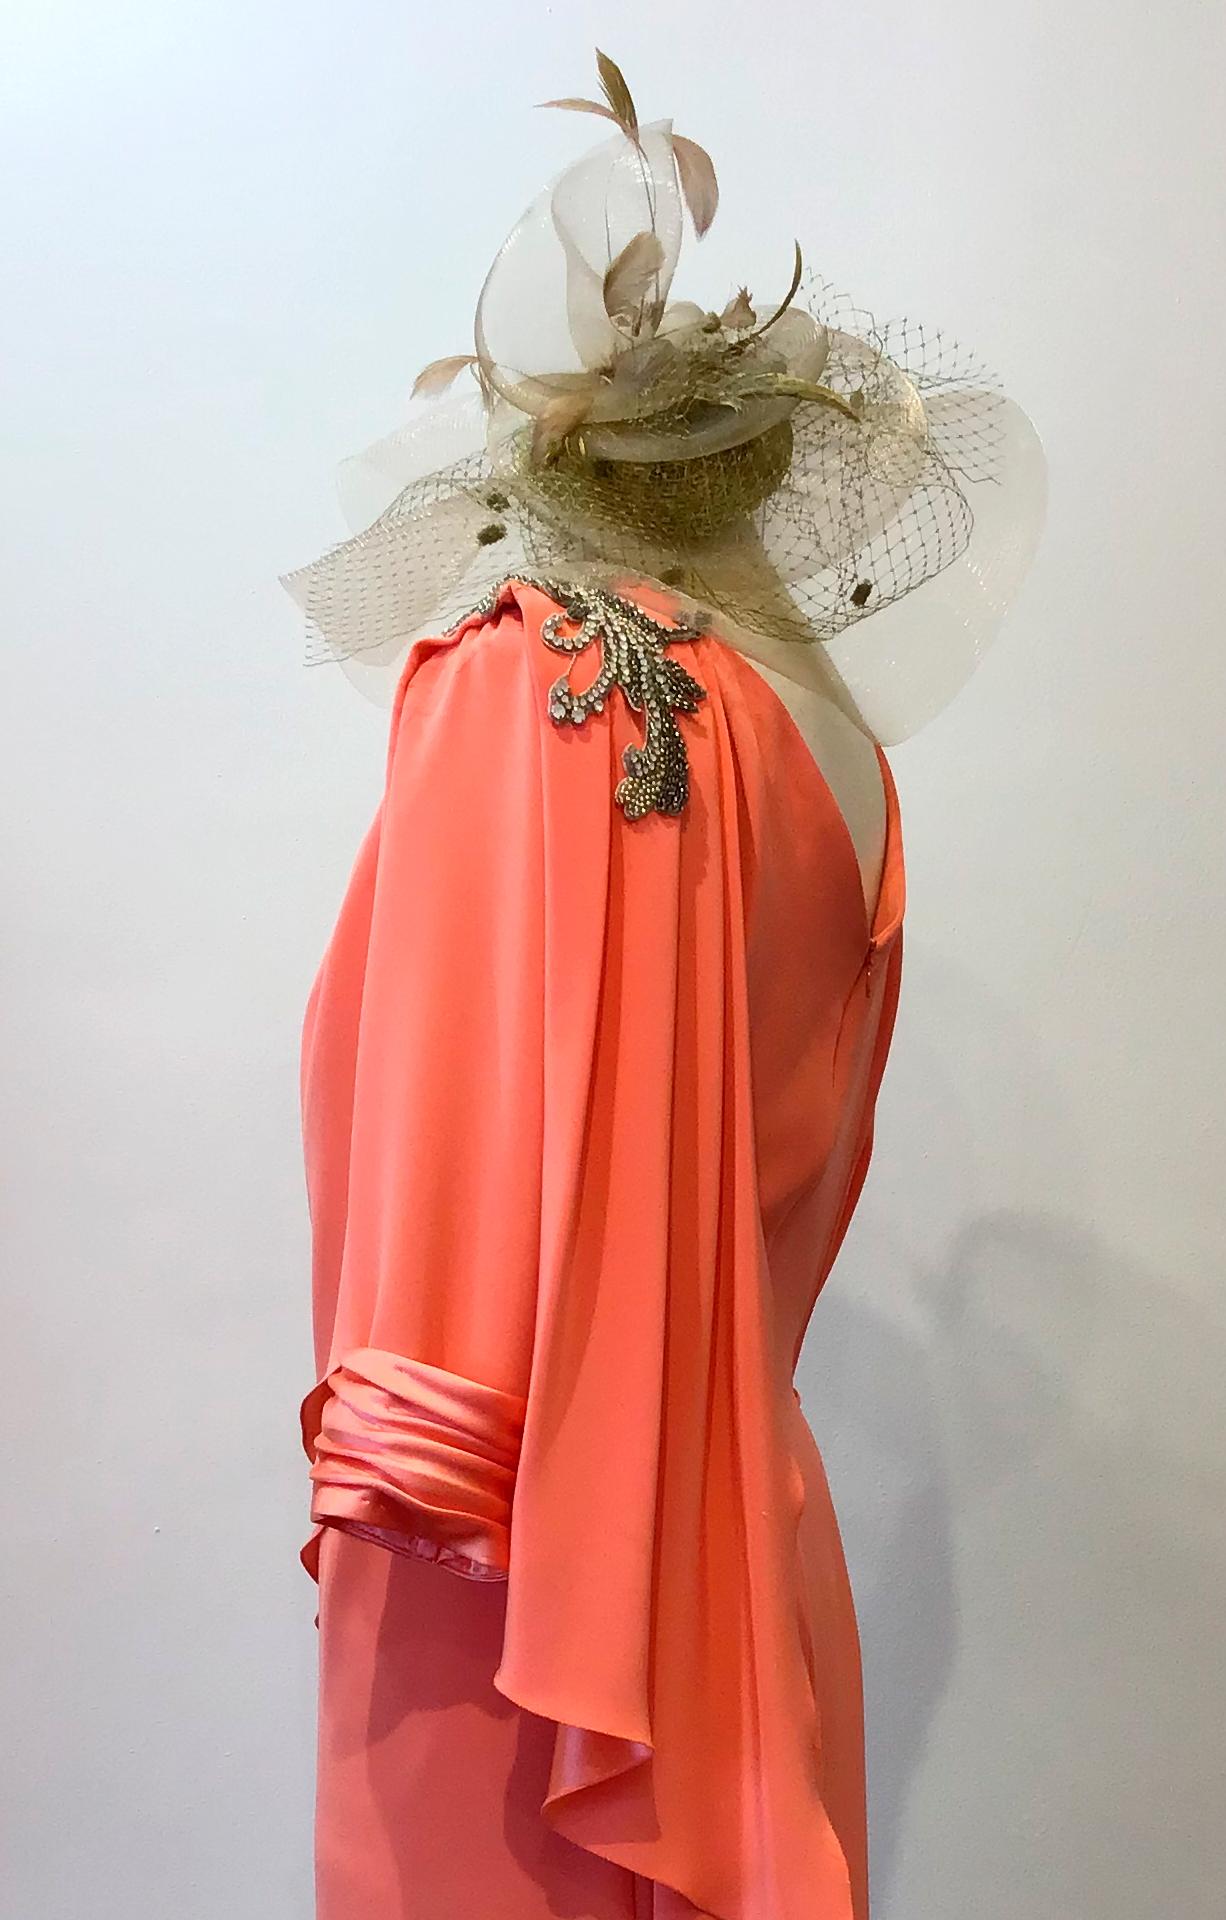 Lola Hurtado Madrinas e Invitadas vestidos para novia Un vestido único para cada mujer